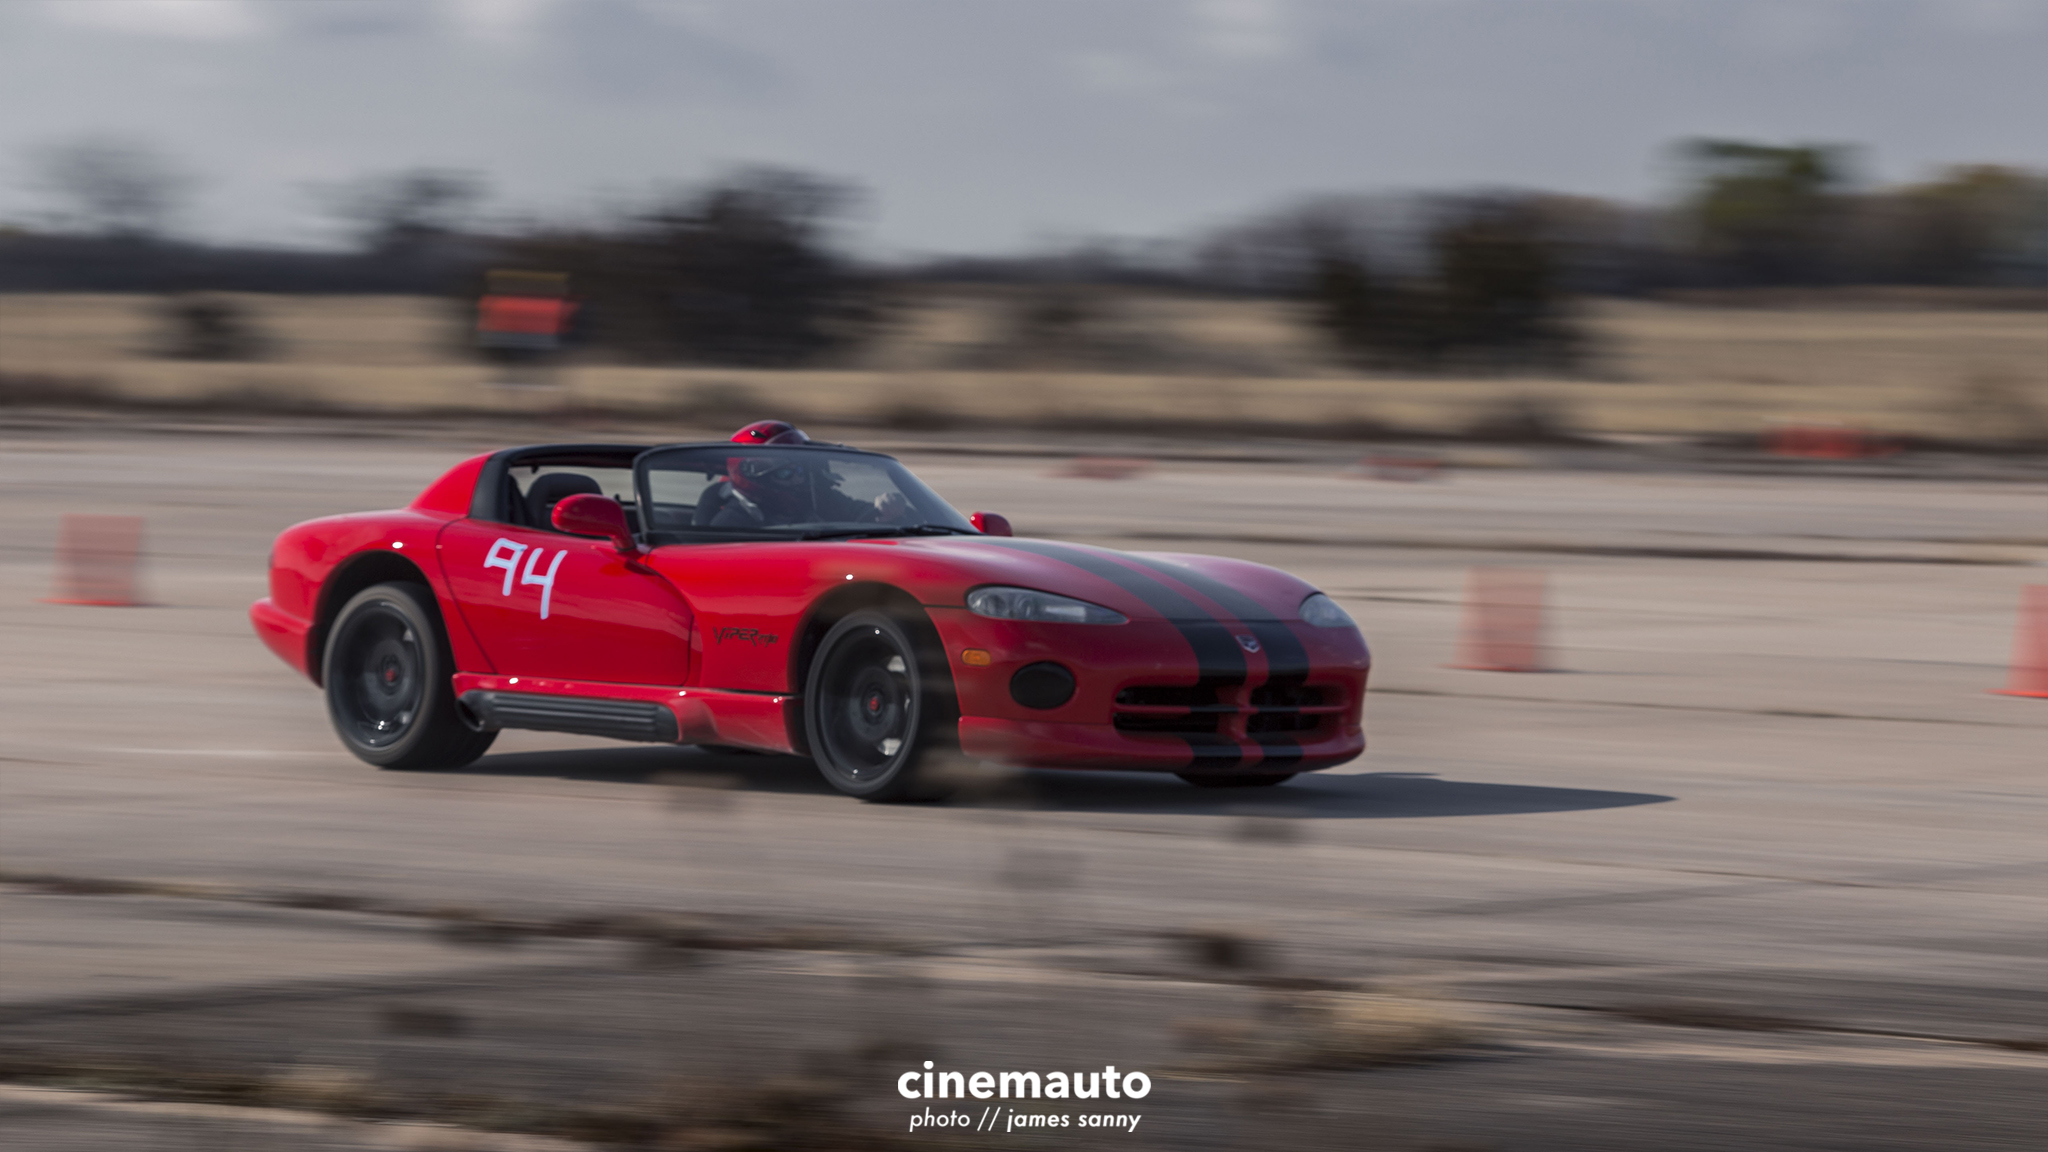 wichita-automotive-photographer-james-sanny-scca9.jpg